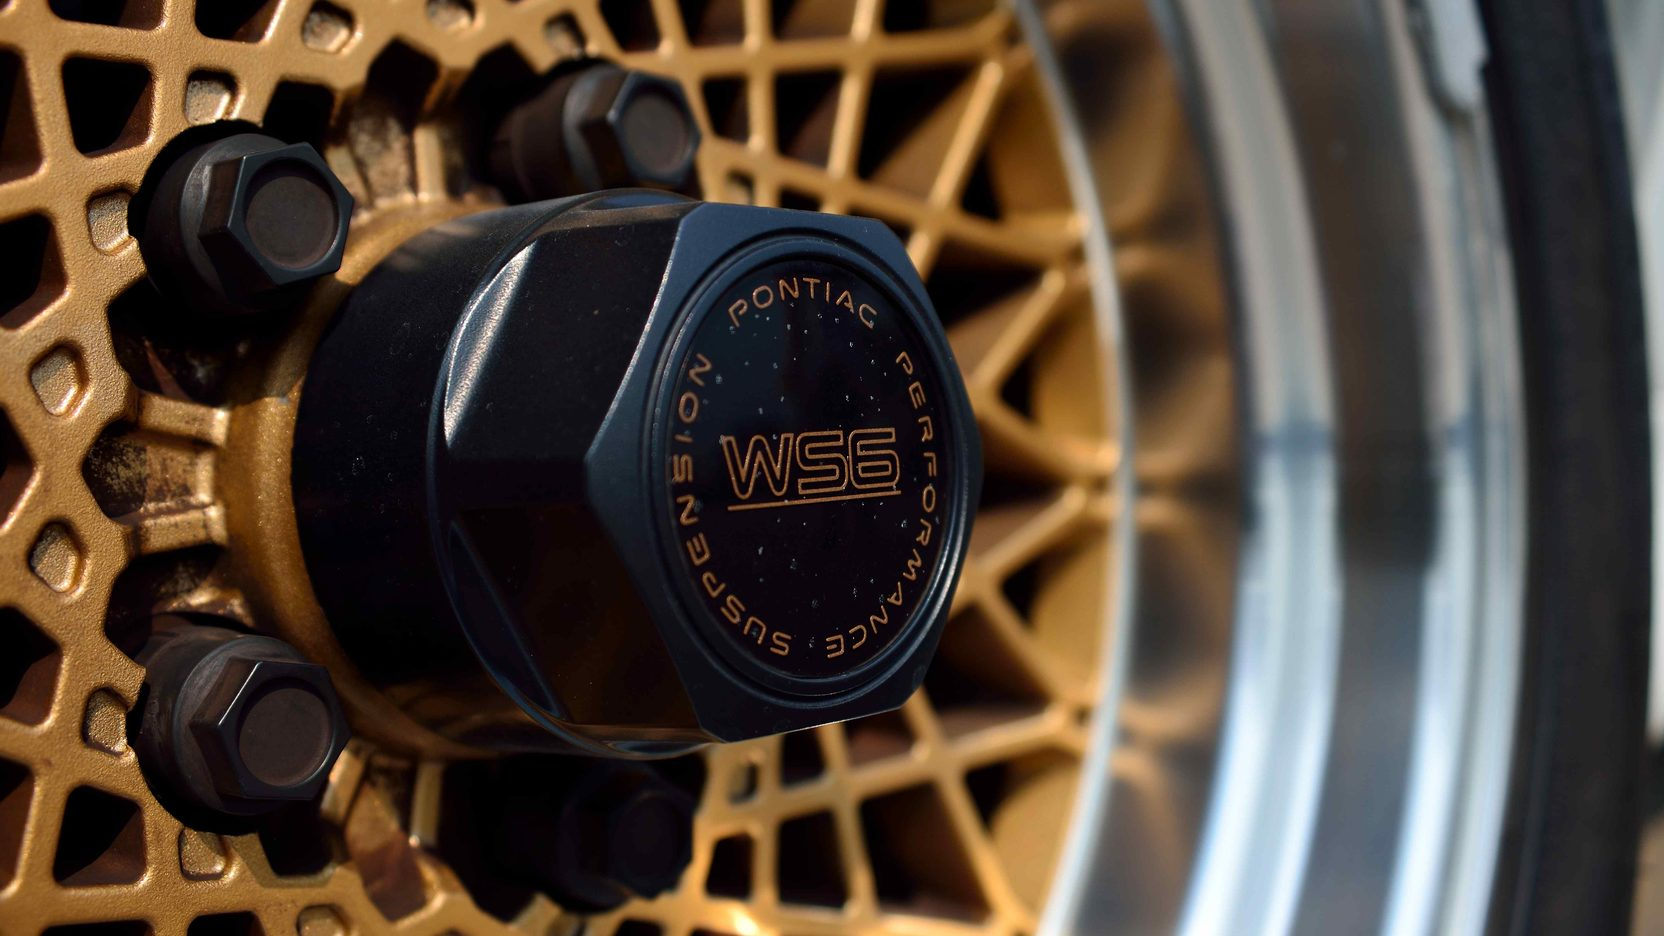 1991 Pontiac Trans Am wheel detail